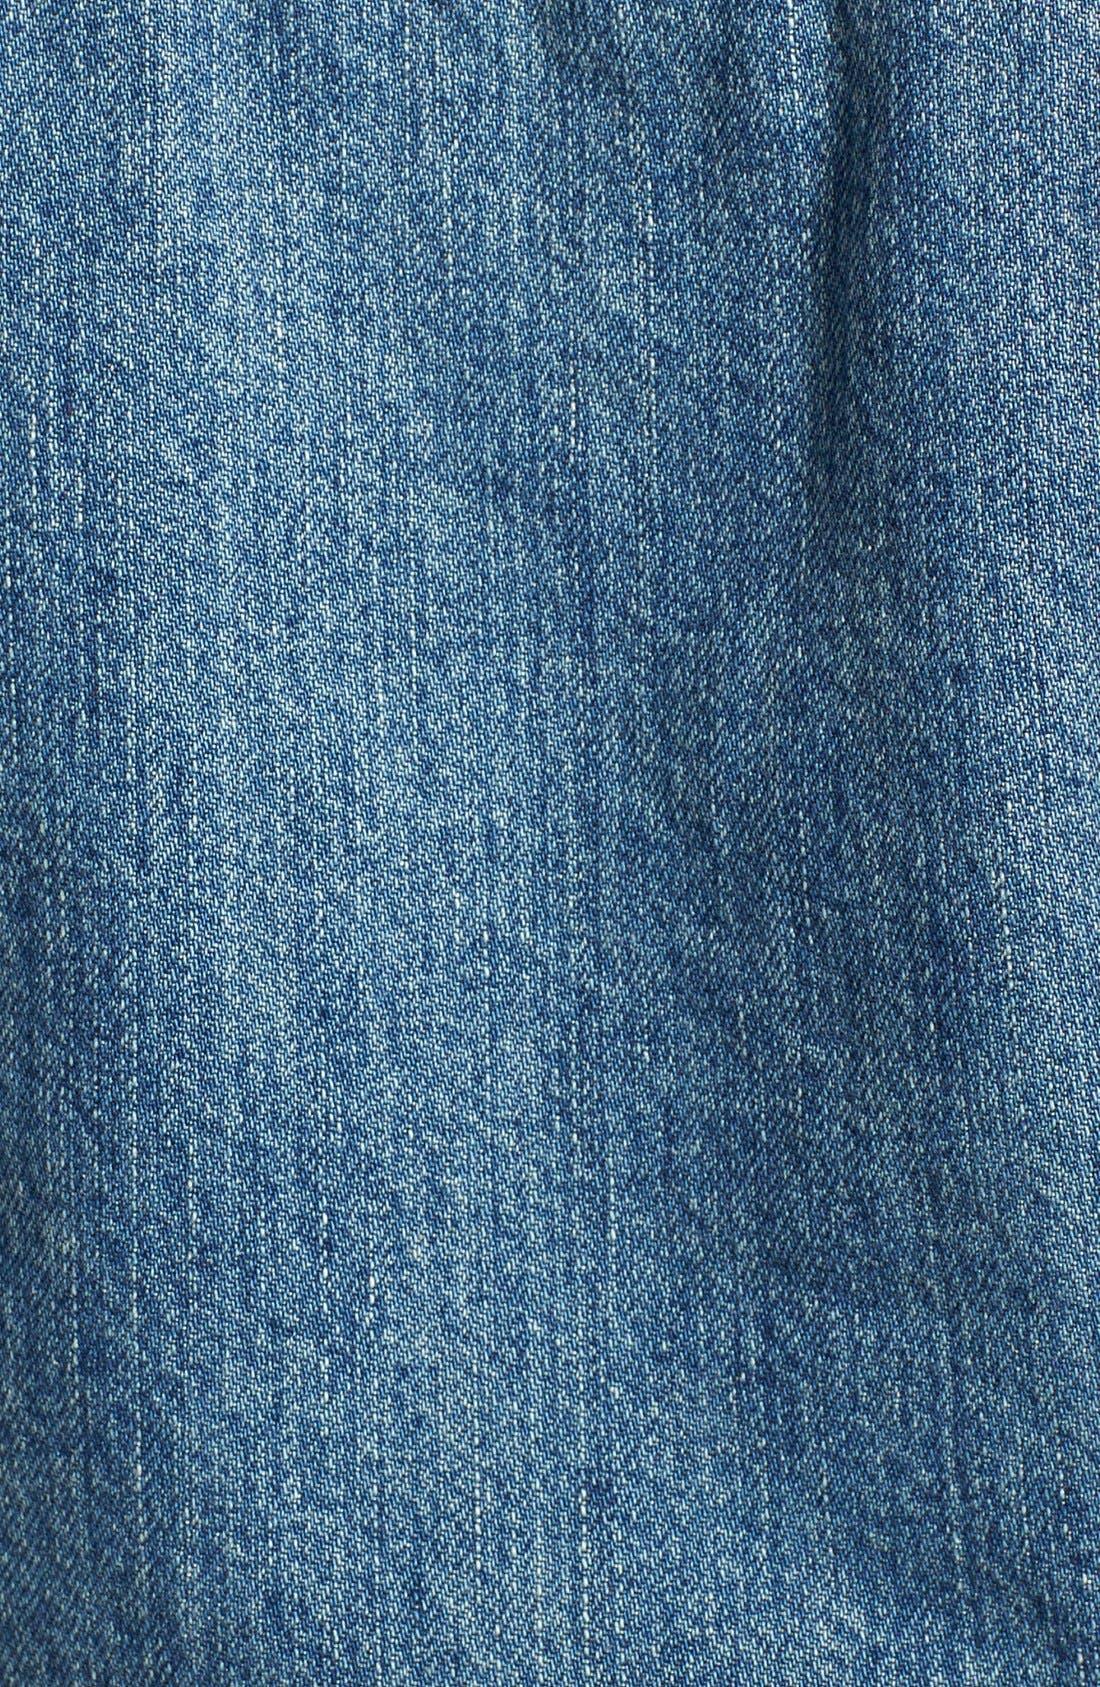 'Summer' Short Sleeve Denim Jacket,                             Alternate thumbnail 3, color,                             407